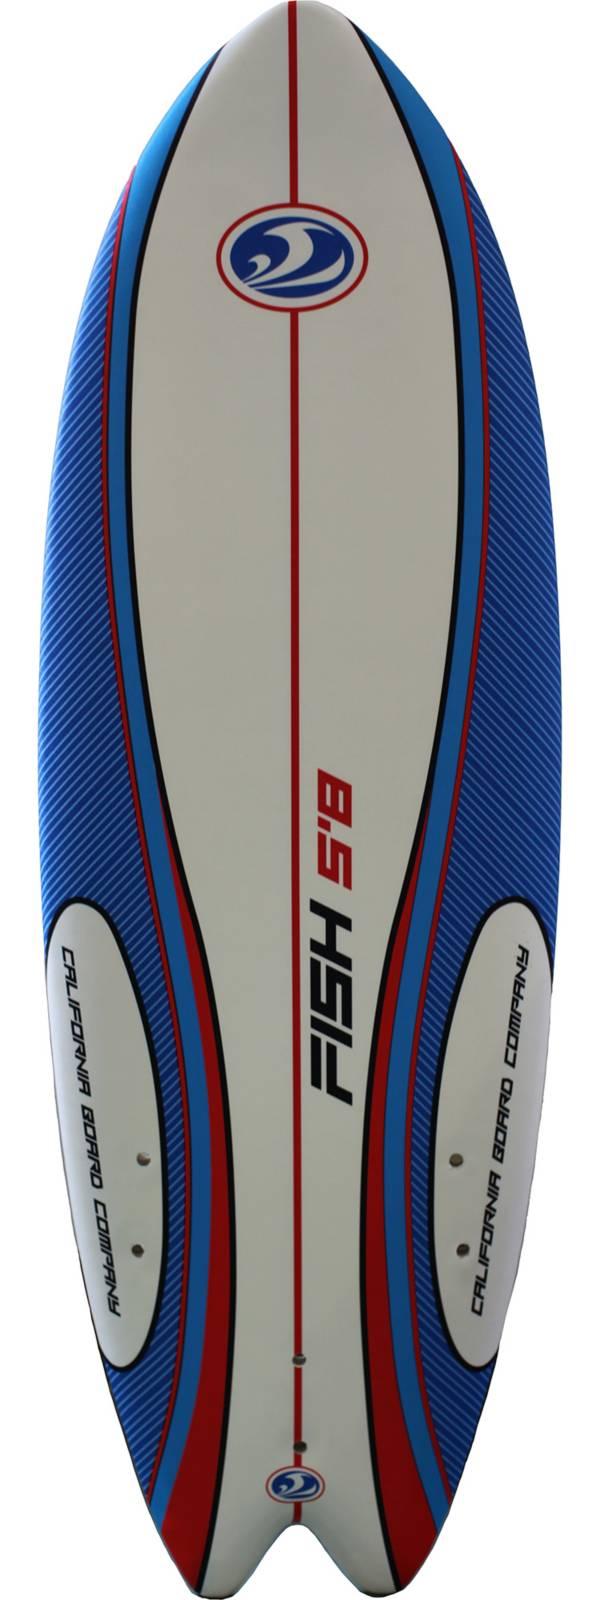 California Board Company Fish 5'8'' Surfboard product image